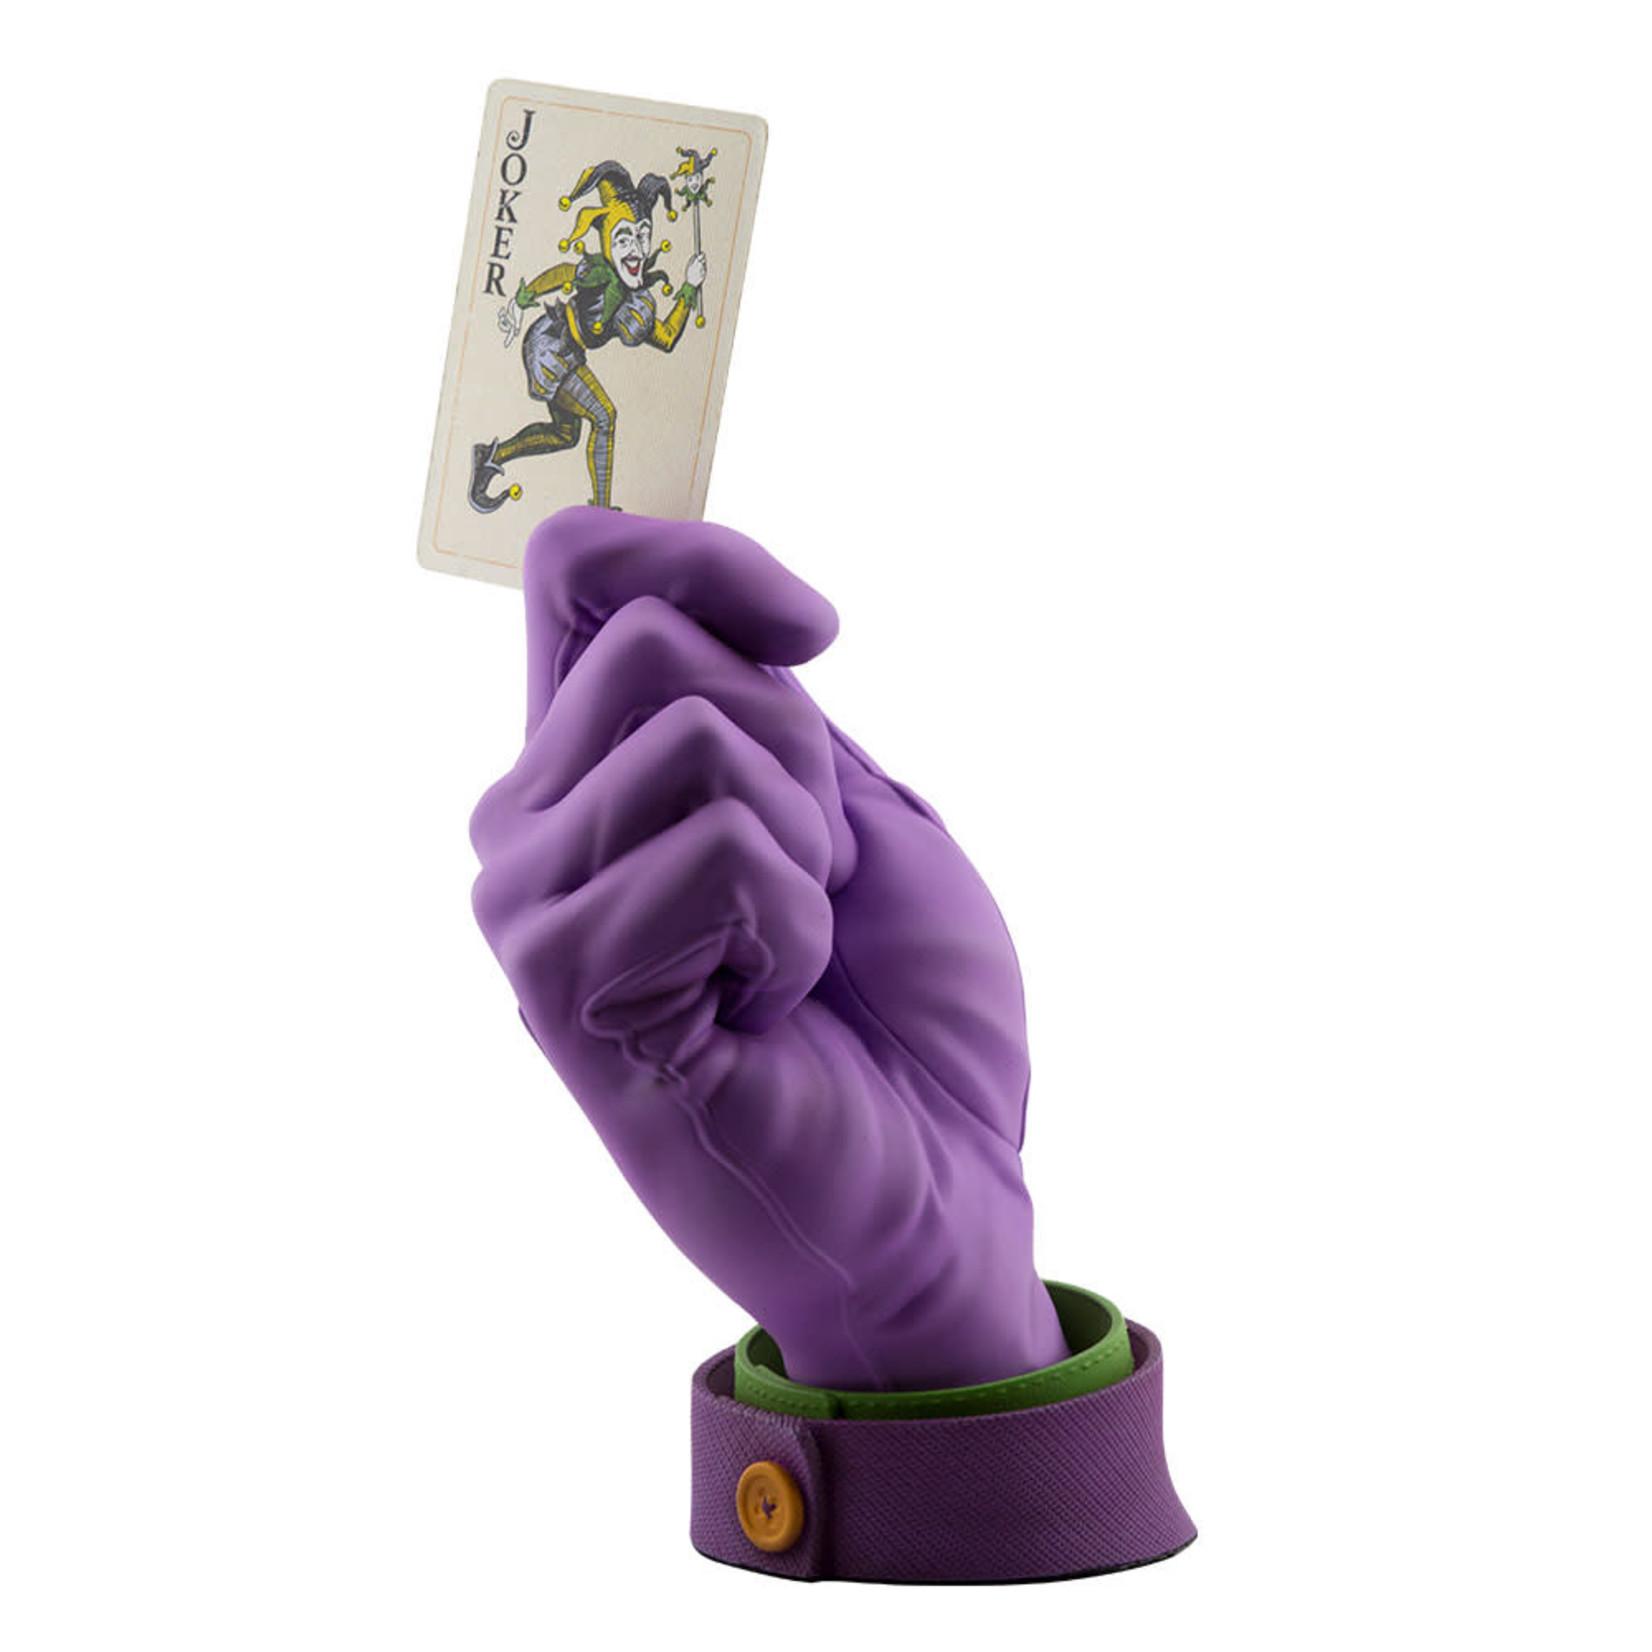 Cryptozoic [Precommande] Cryptozoic DC Comics: JOKER CALLING CARD